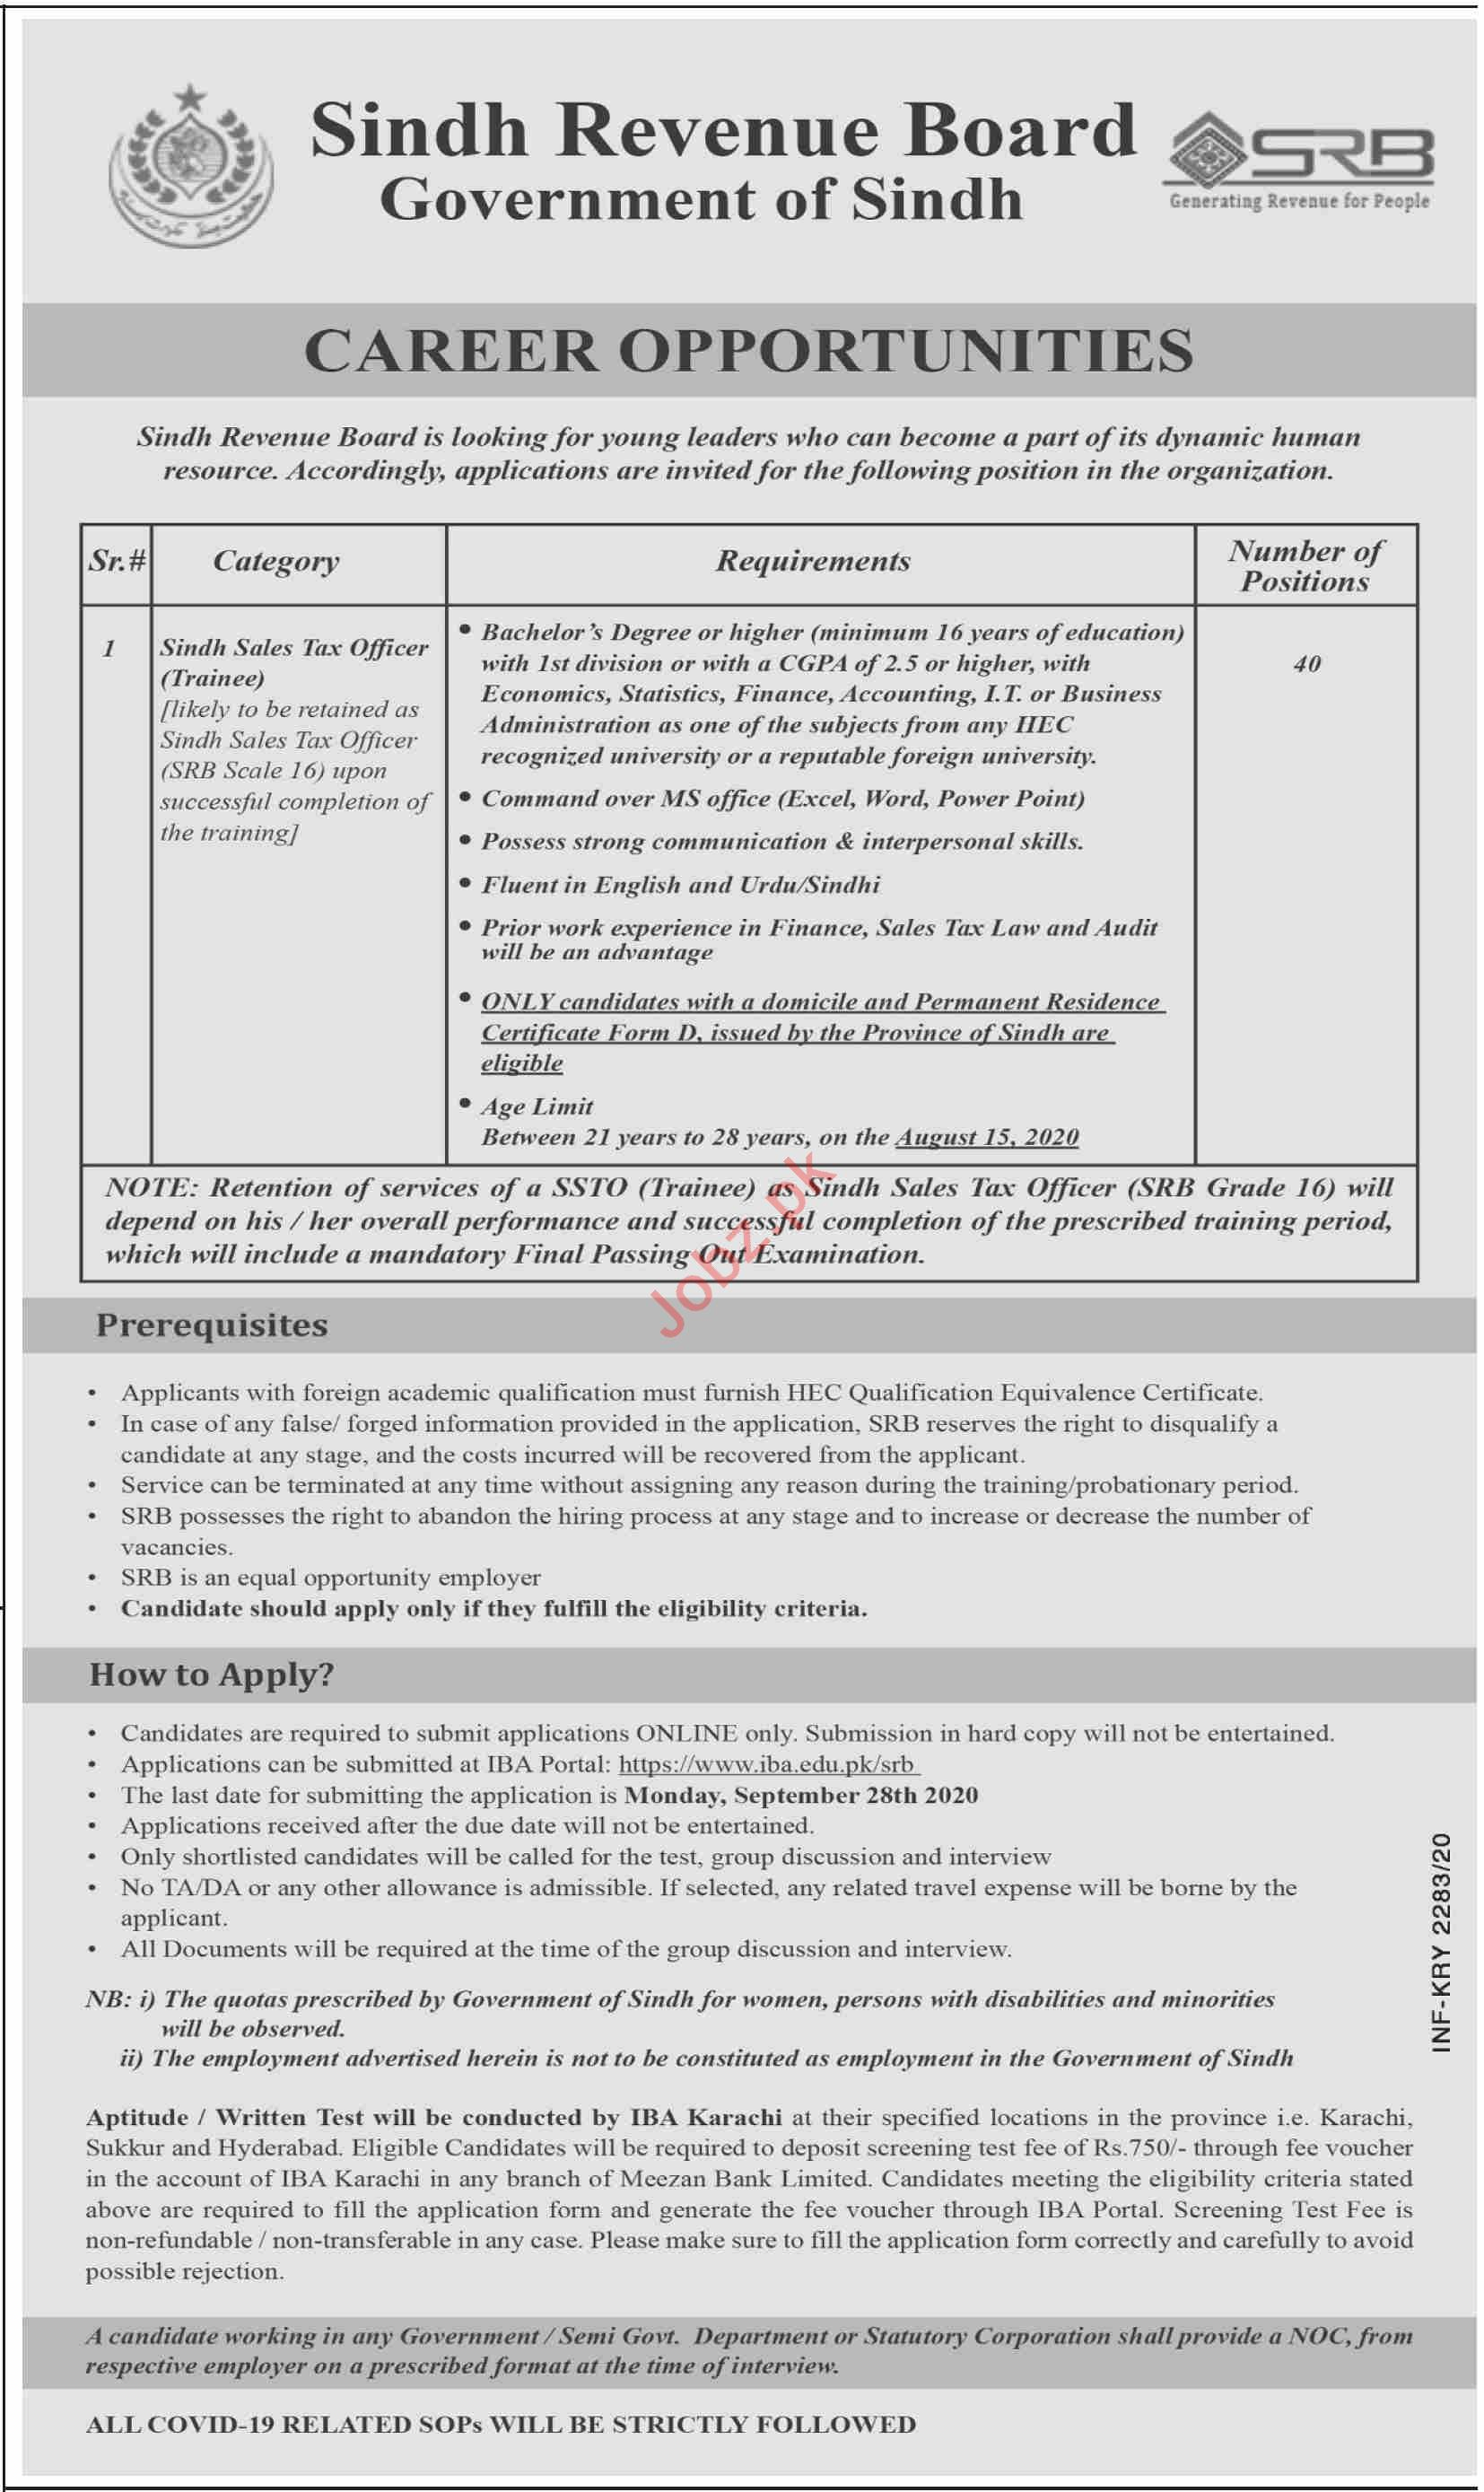 Sindh Revenue Board SRB Karachi Jobs 2020 for Tax Officer